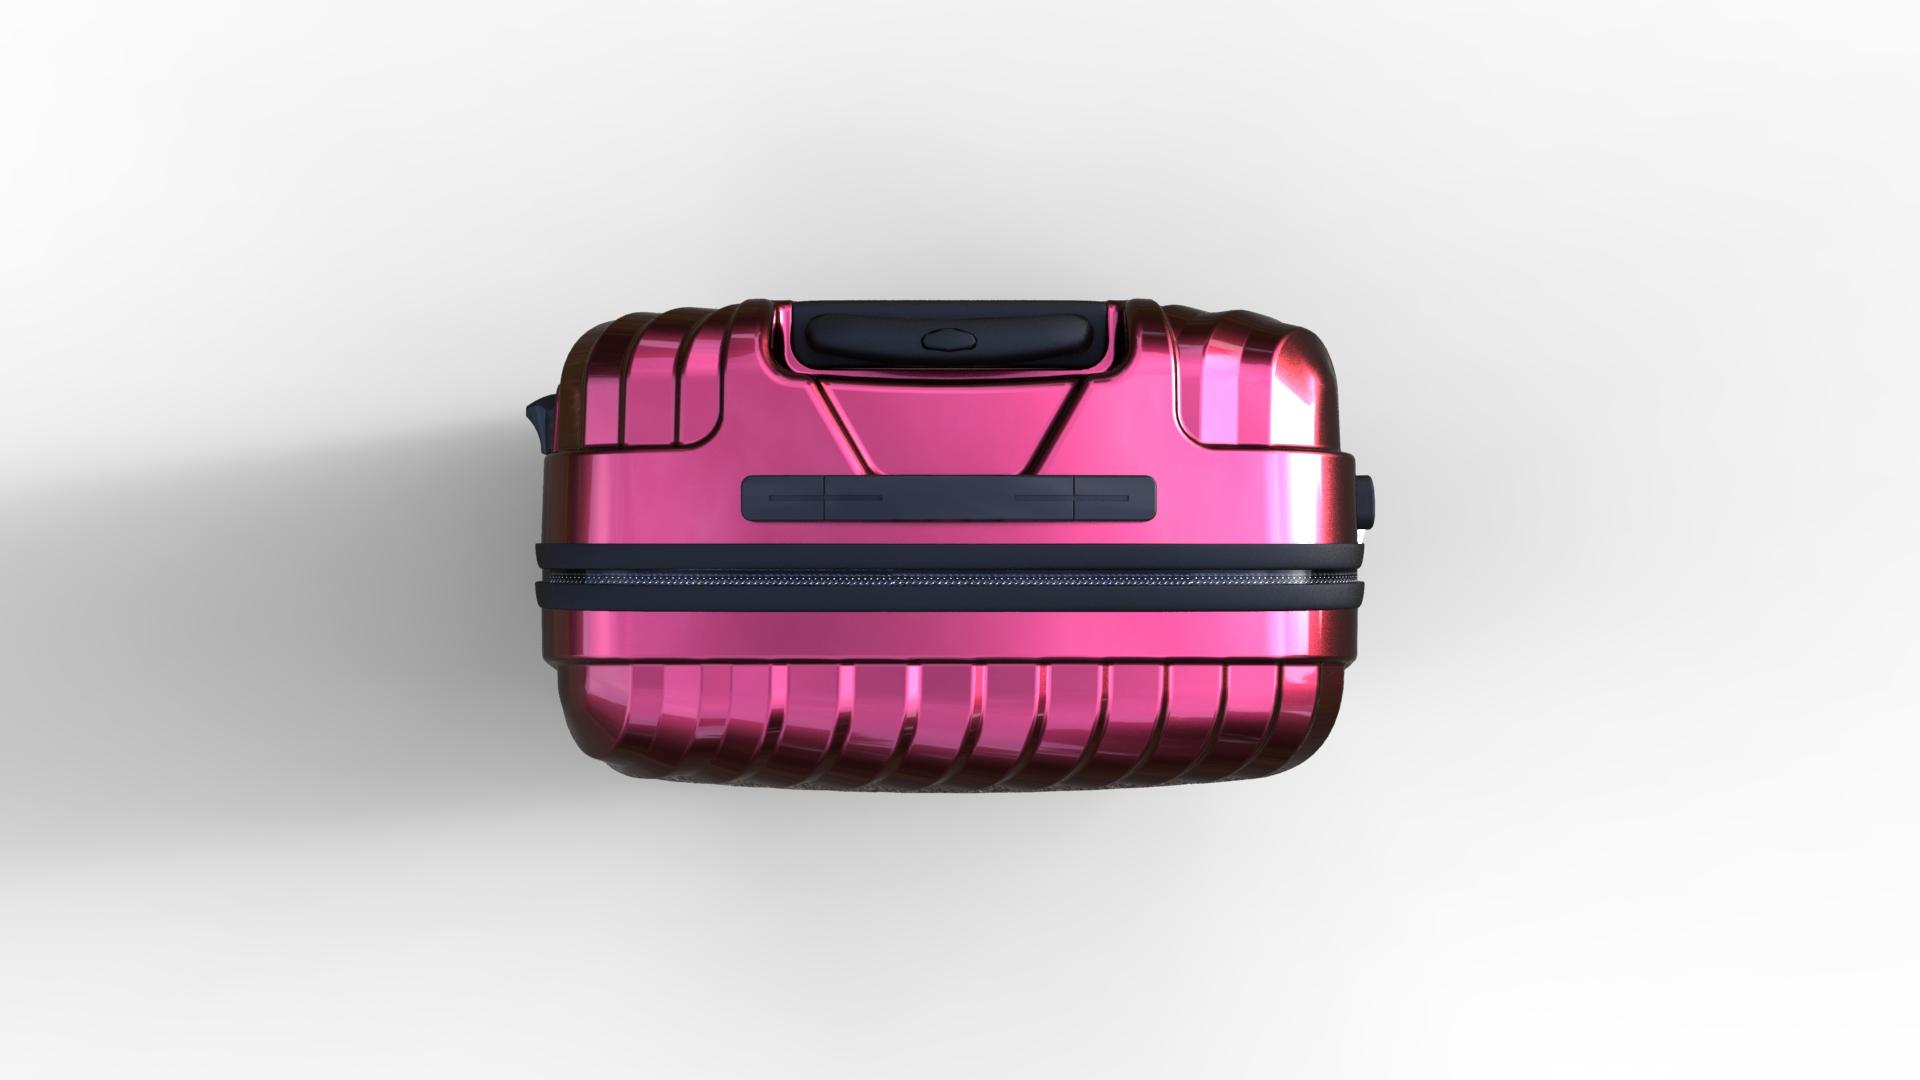 trolley suitcase bag 03 3d model max fbx ma mb obj 286002